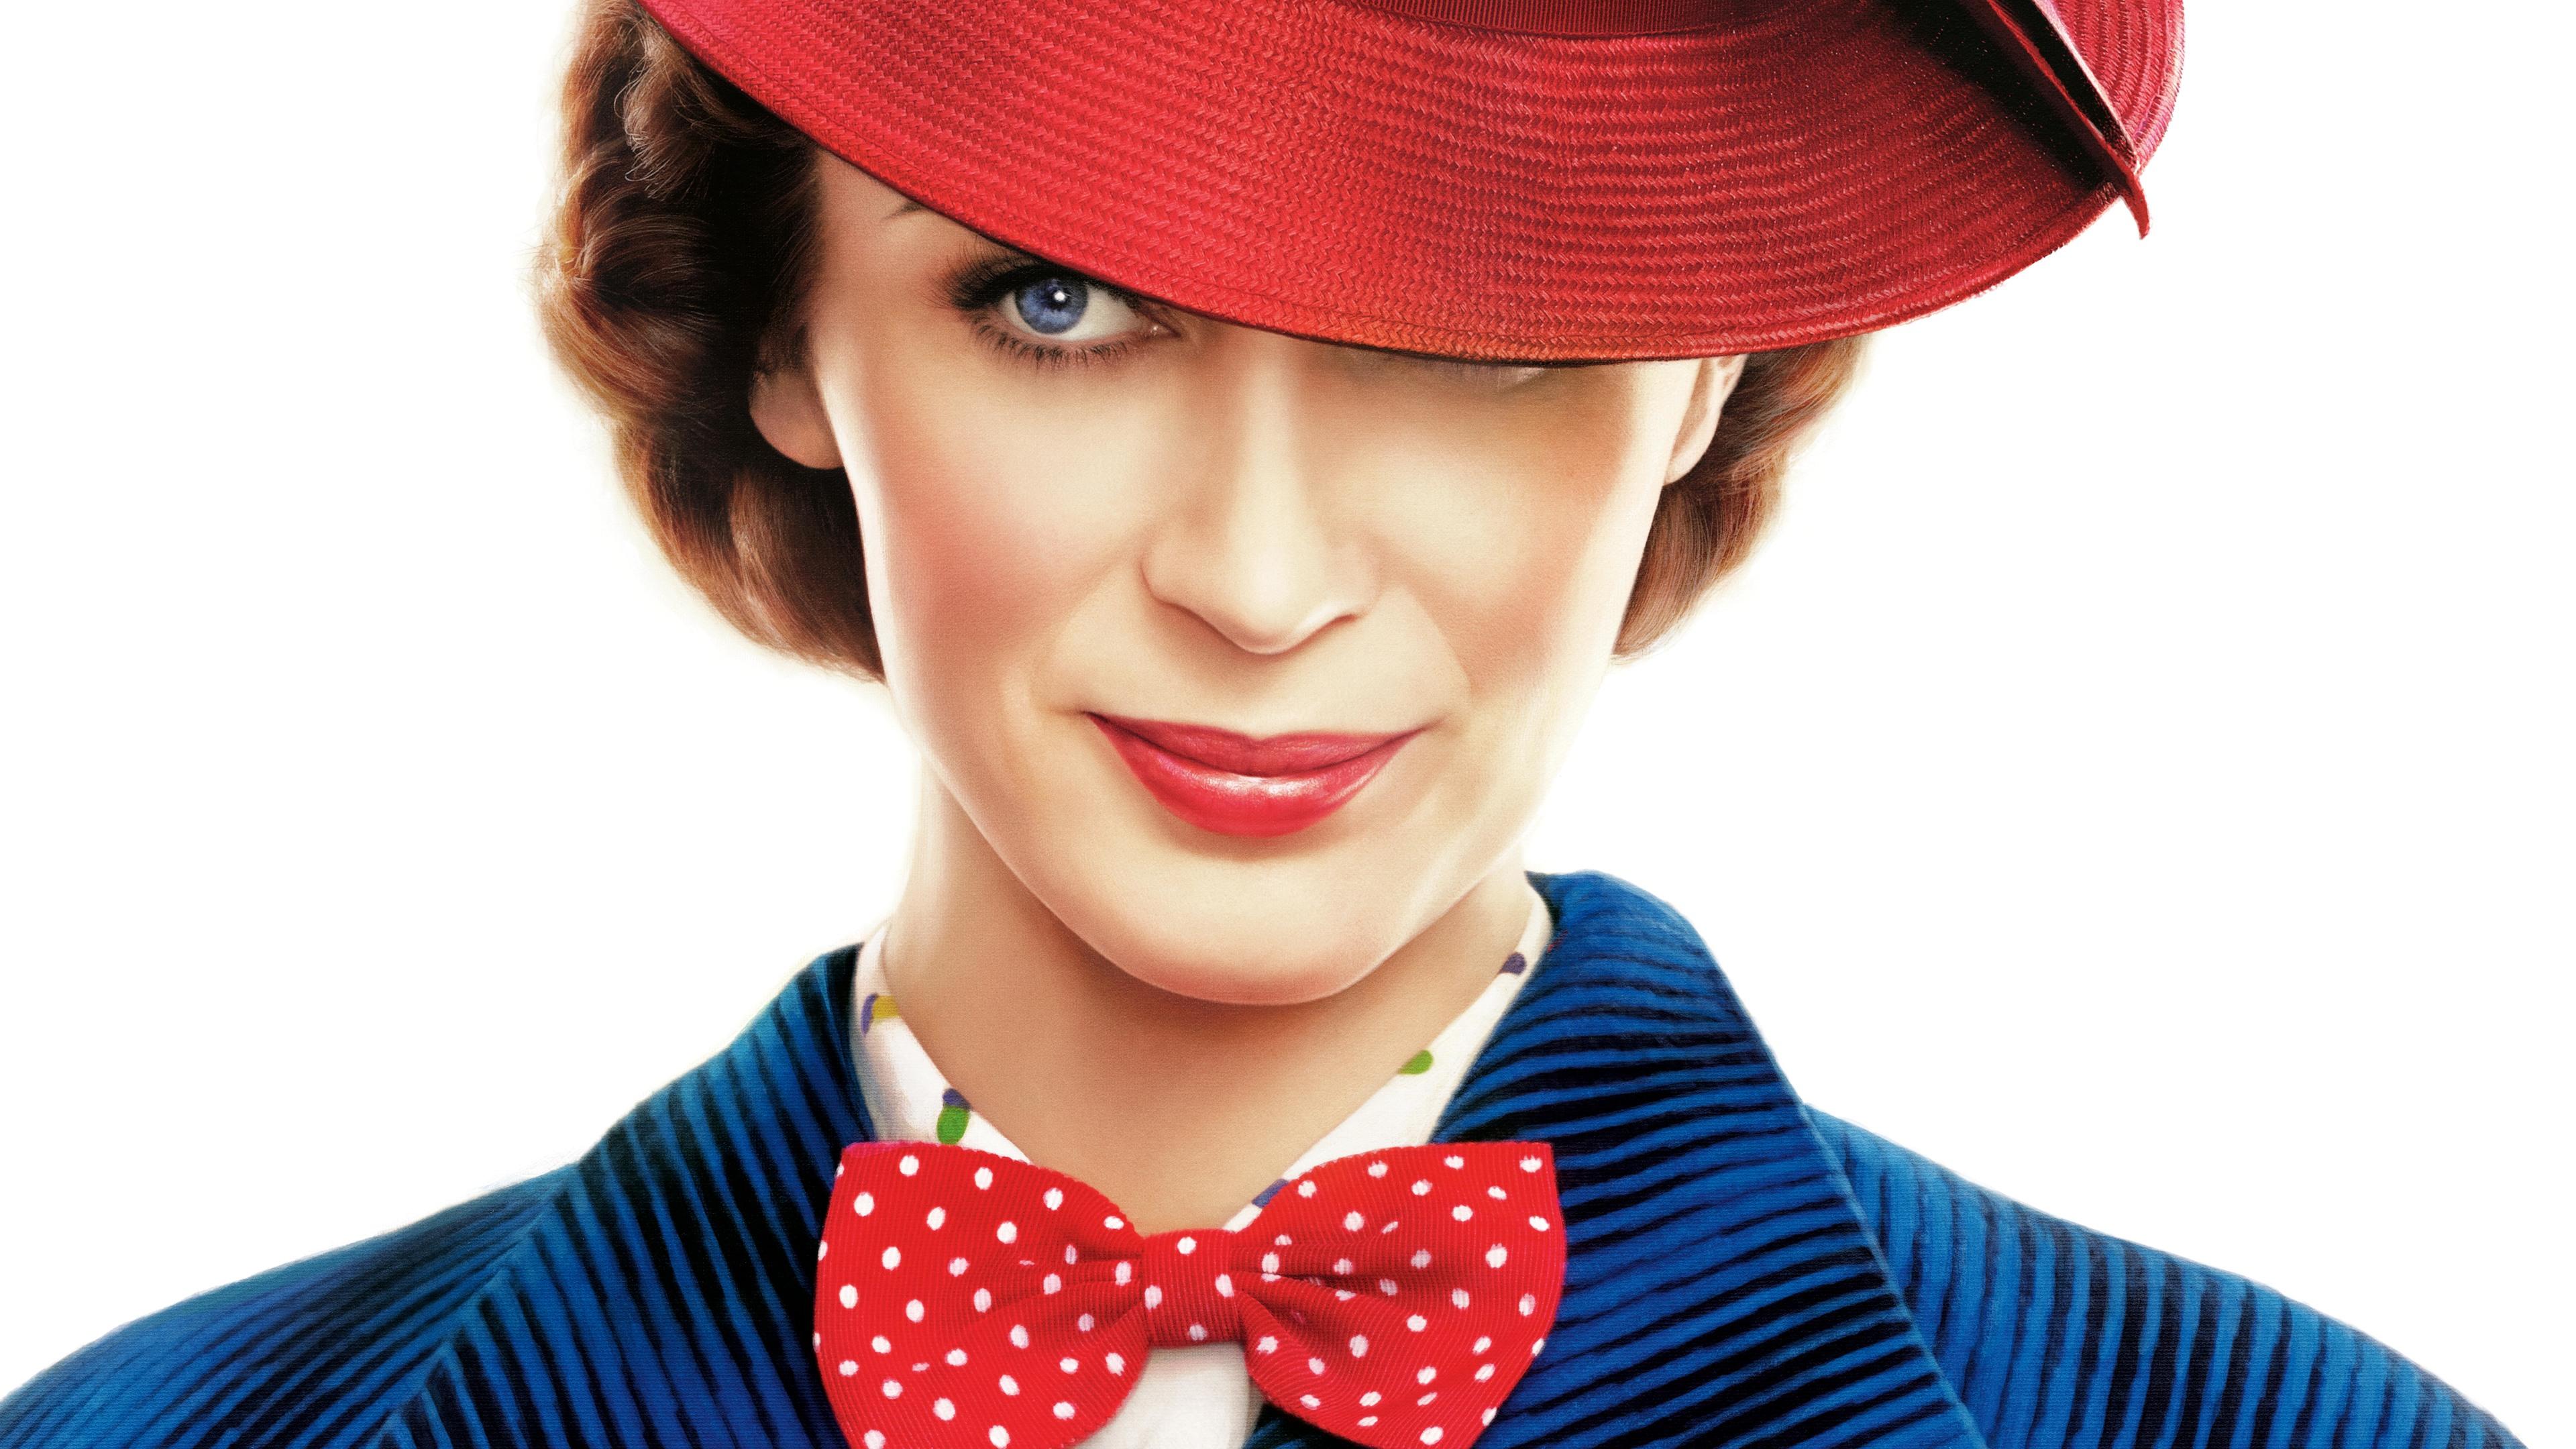 mary poppins returns 12k movie 1541719519 - Mary Poppins Returns 4k Movie - movies wallpapers, mary poppins returns wallpapers, hd-wallpapers, emily blunt wallpapers, 4k-wallpapers, 2018-movies-wallpapers, 12k wallpapers, 10k wallpapers